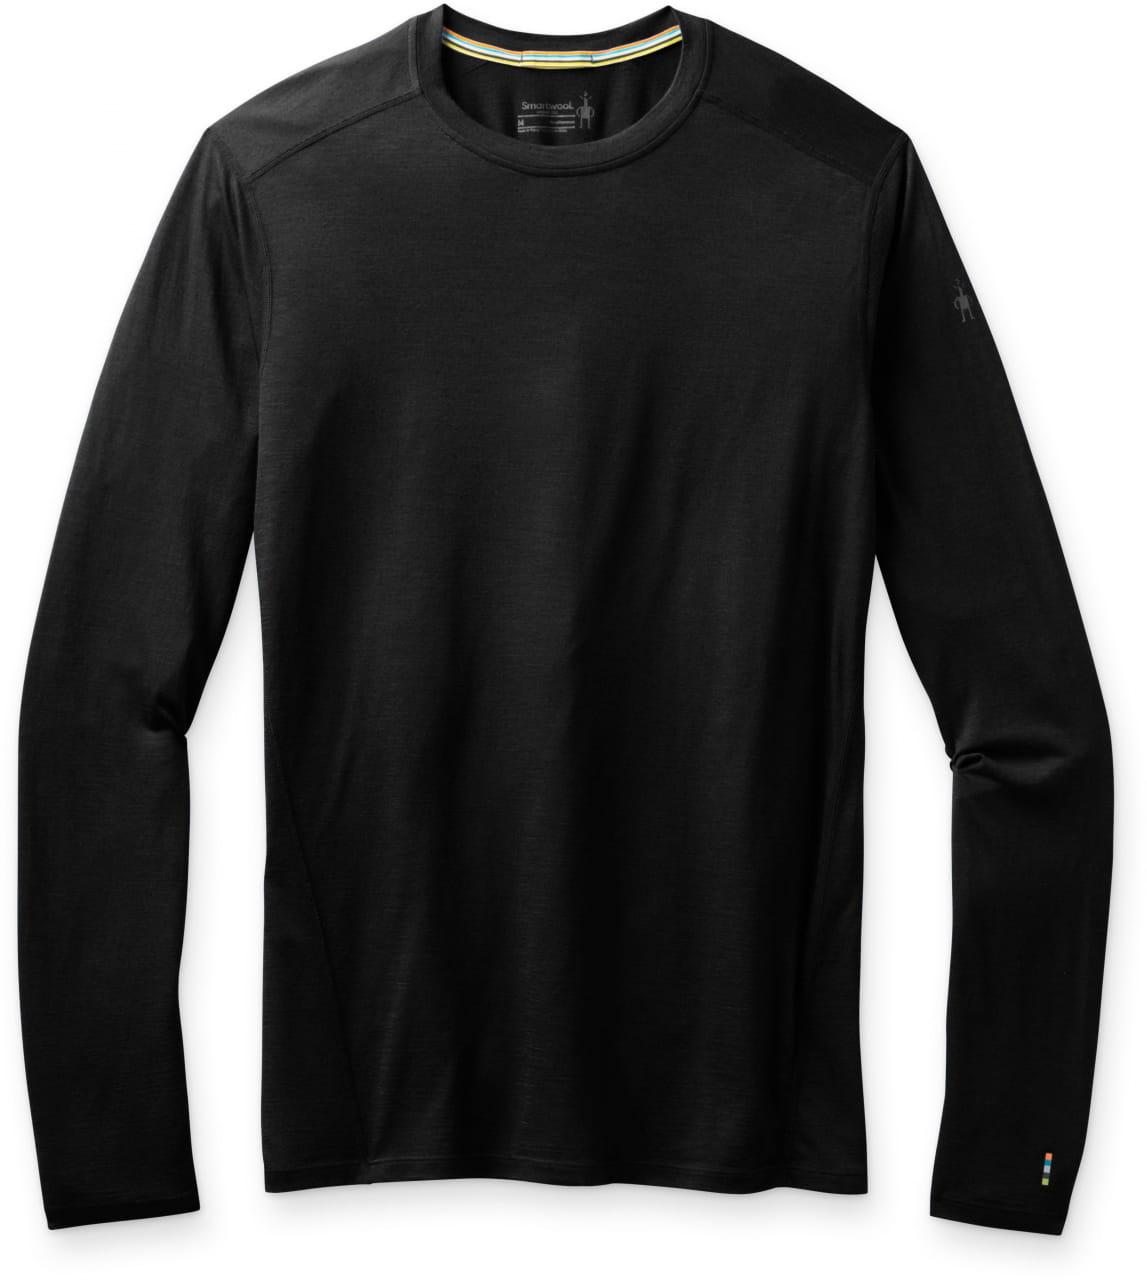 Pánské triko Smartwool M Merino 150 Baselr Ls